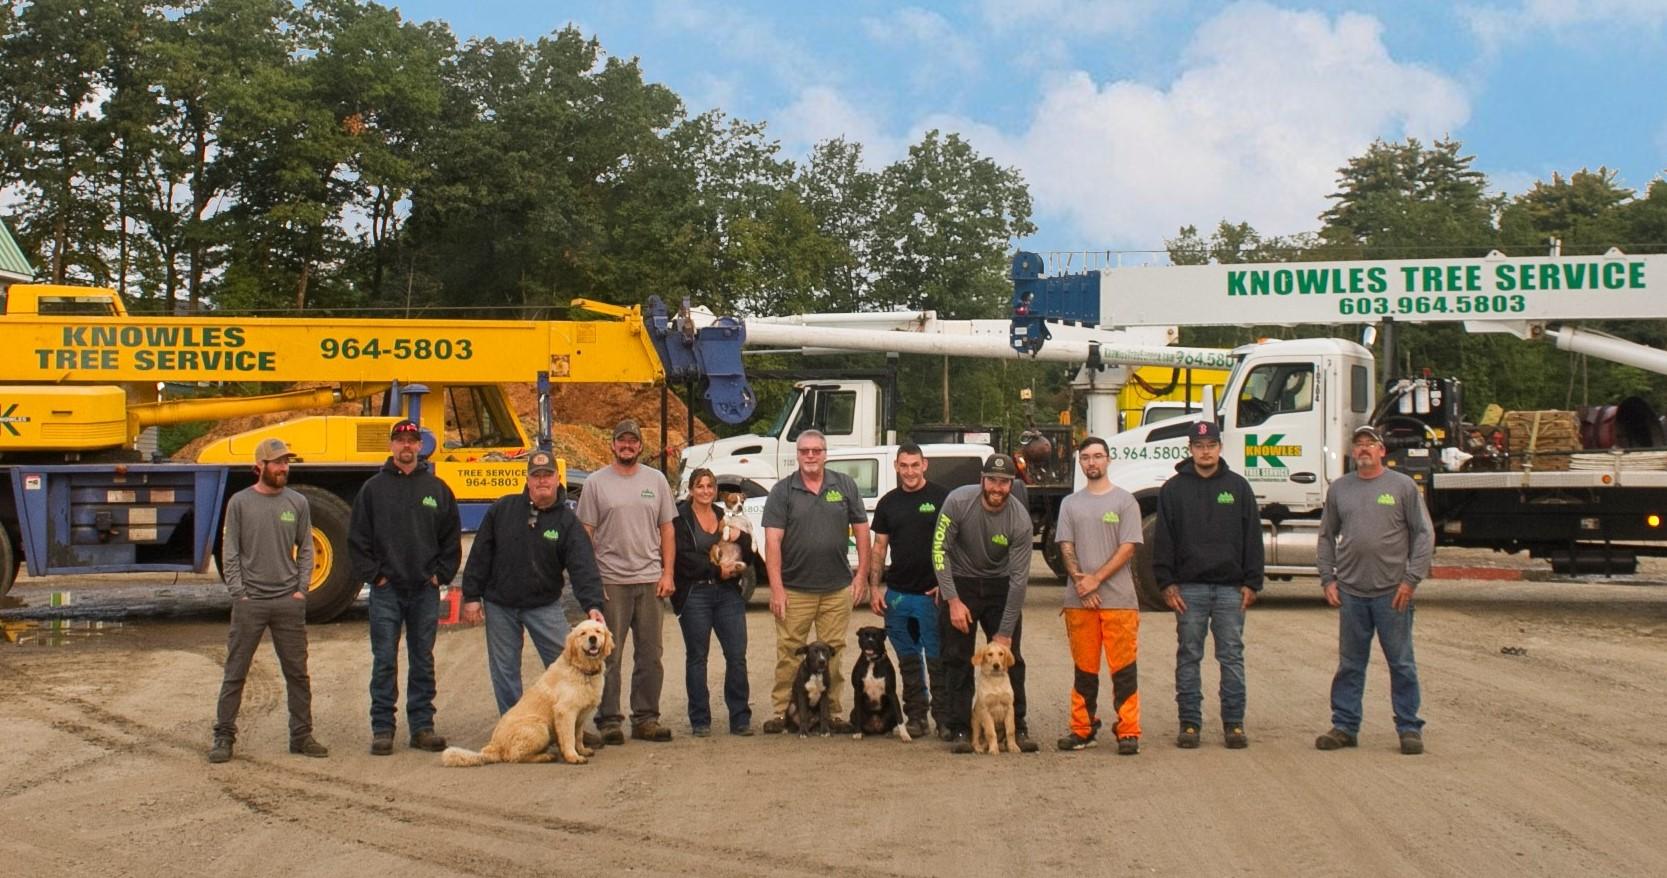 Knowles Tree Service 2020 Crew